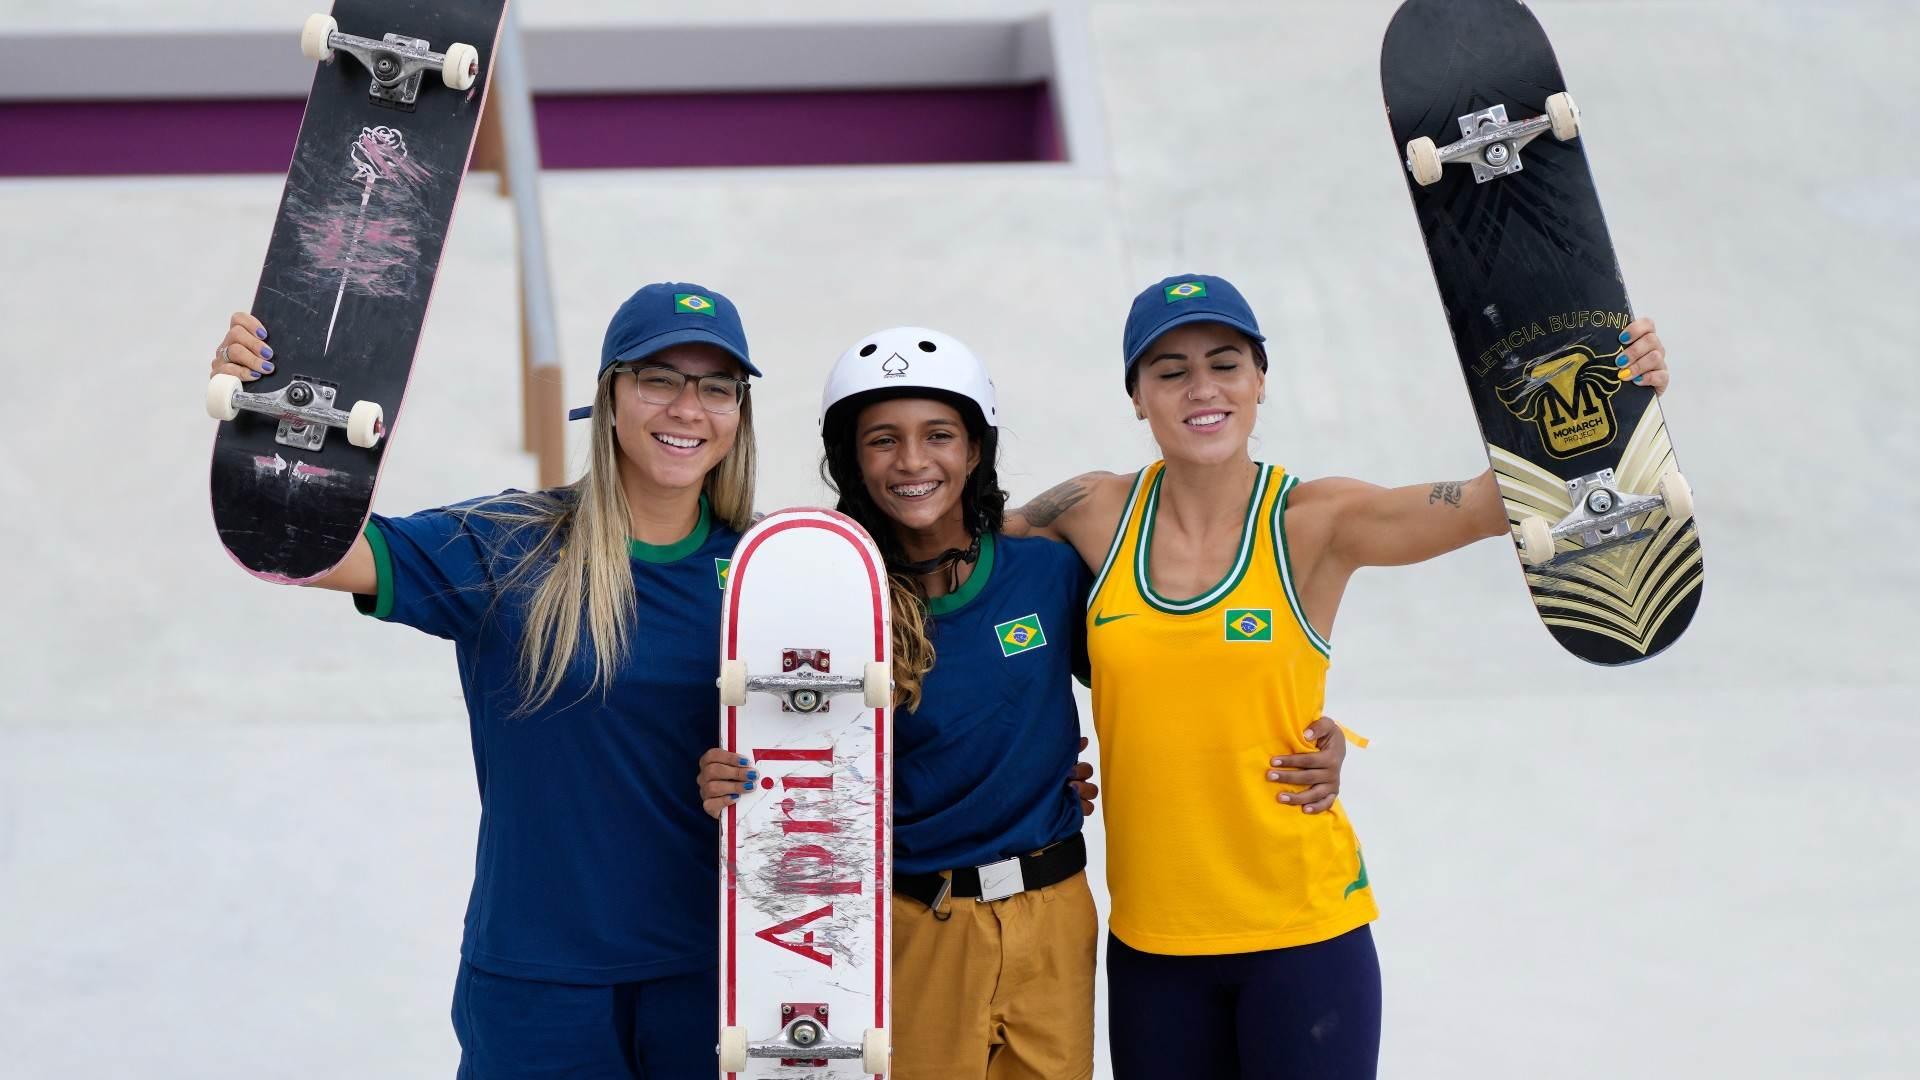 Pamela Rosa, Rayssa Leal e Leticia Bufoni, do skate brasileiro nas Olimpíadas